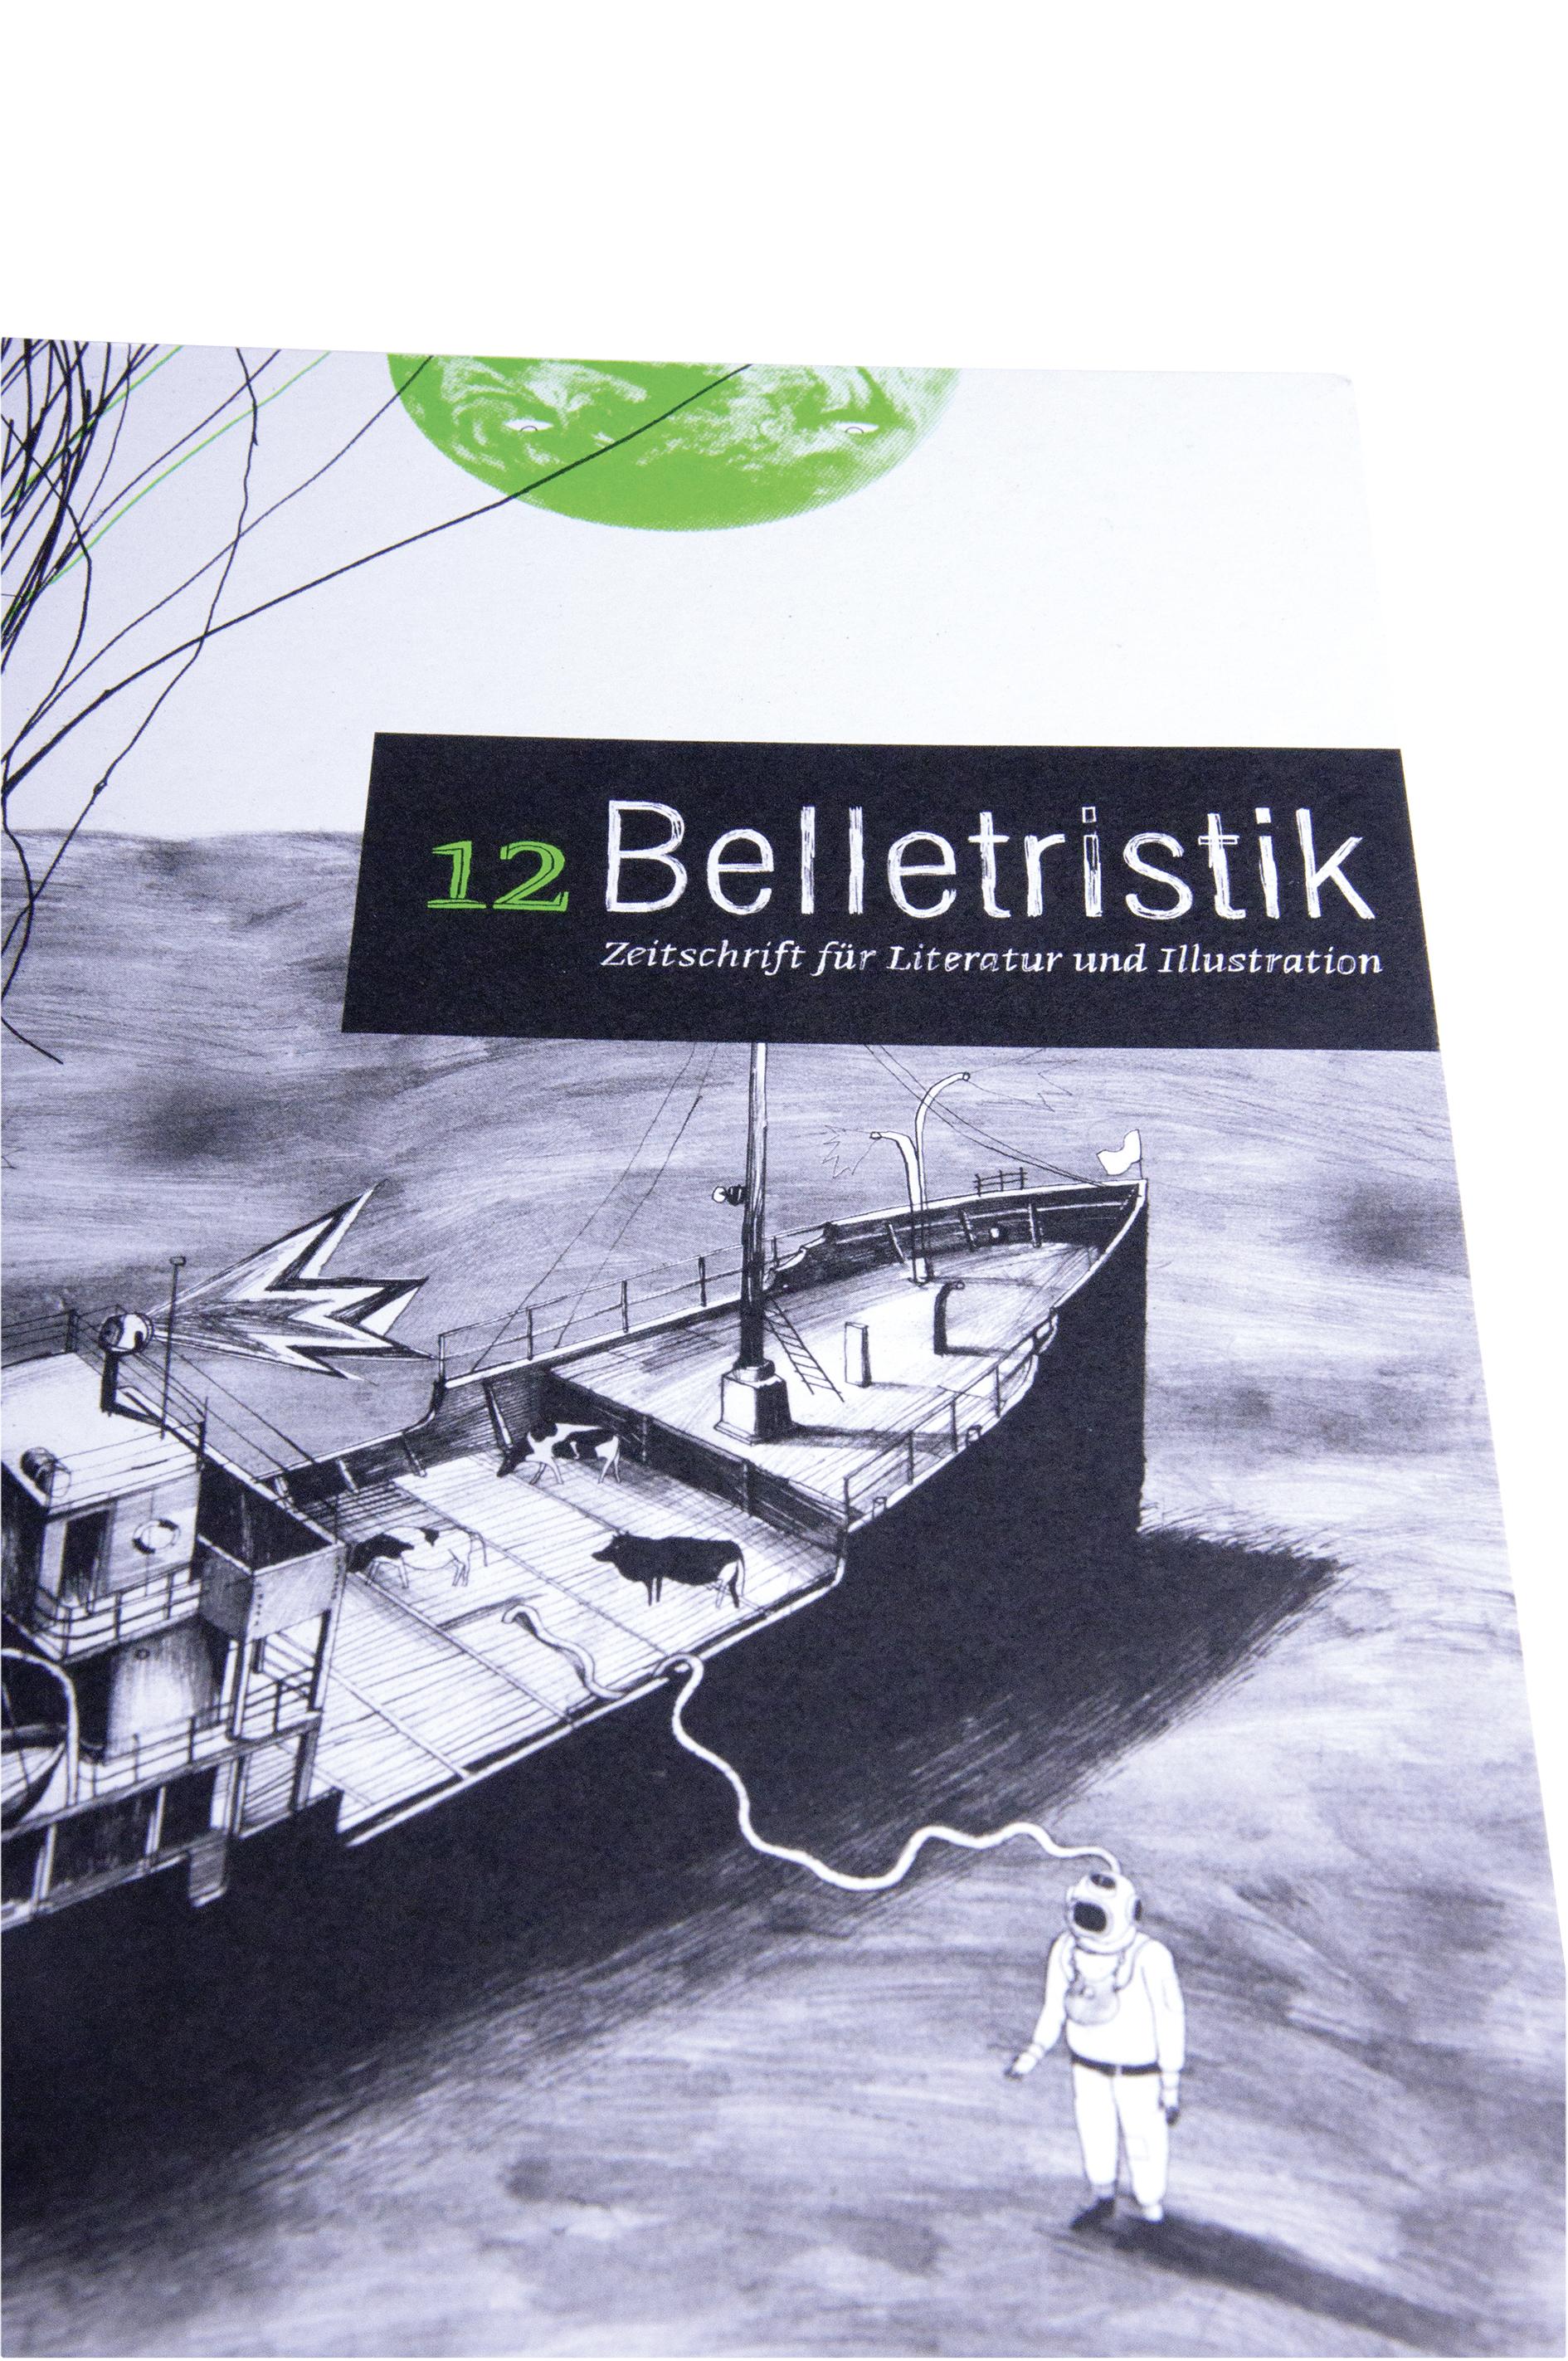 Belletristik Magazin Cover